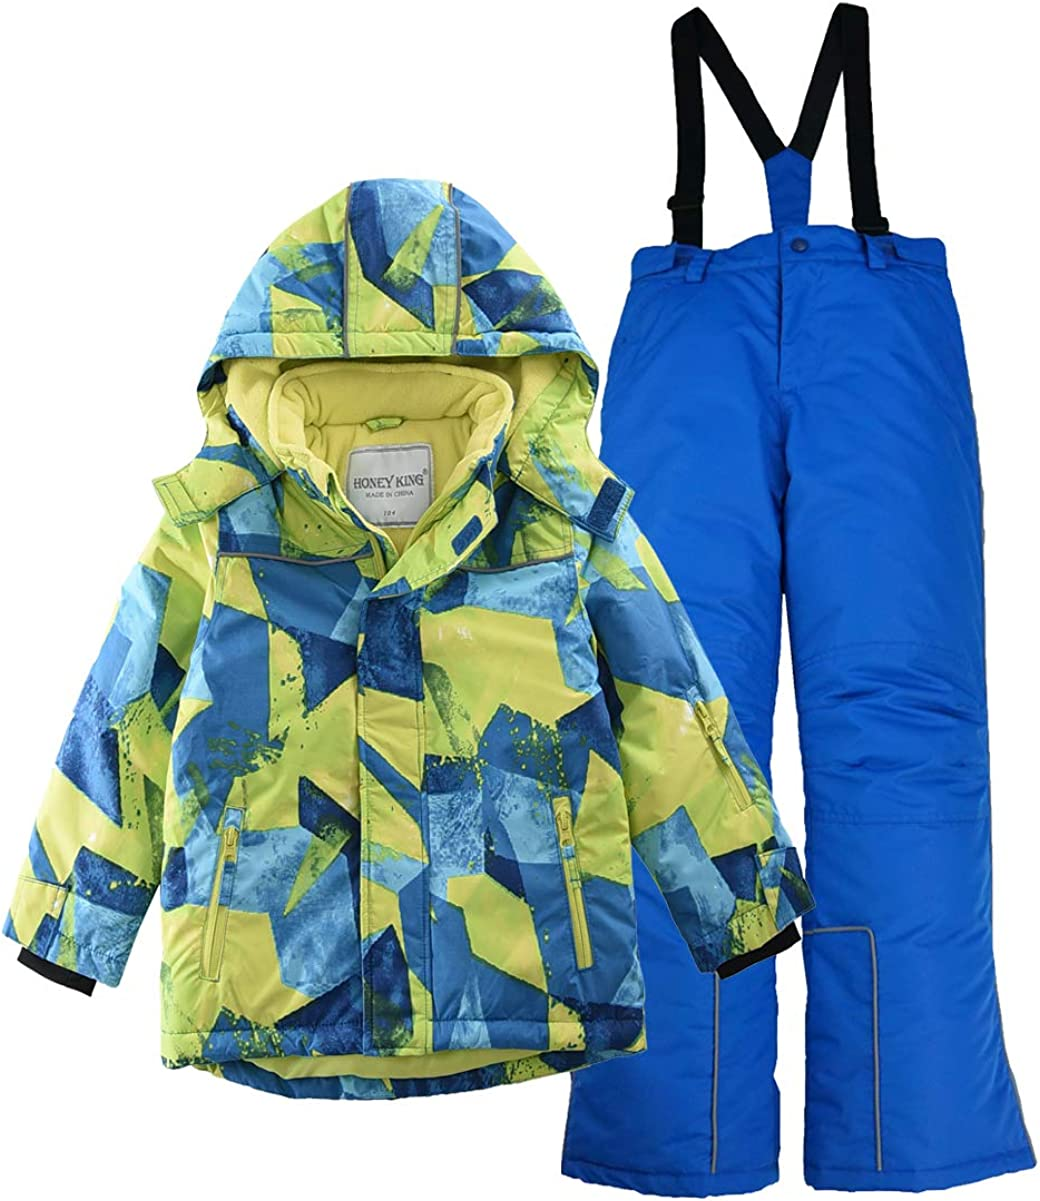 Las Vegas Mall M2C Boys Thicken Warm Max 53% OFF Hooded Jacket Pants Ski Striped Snowsuit